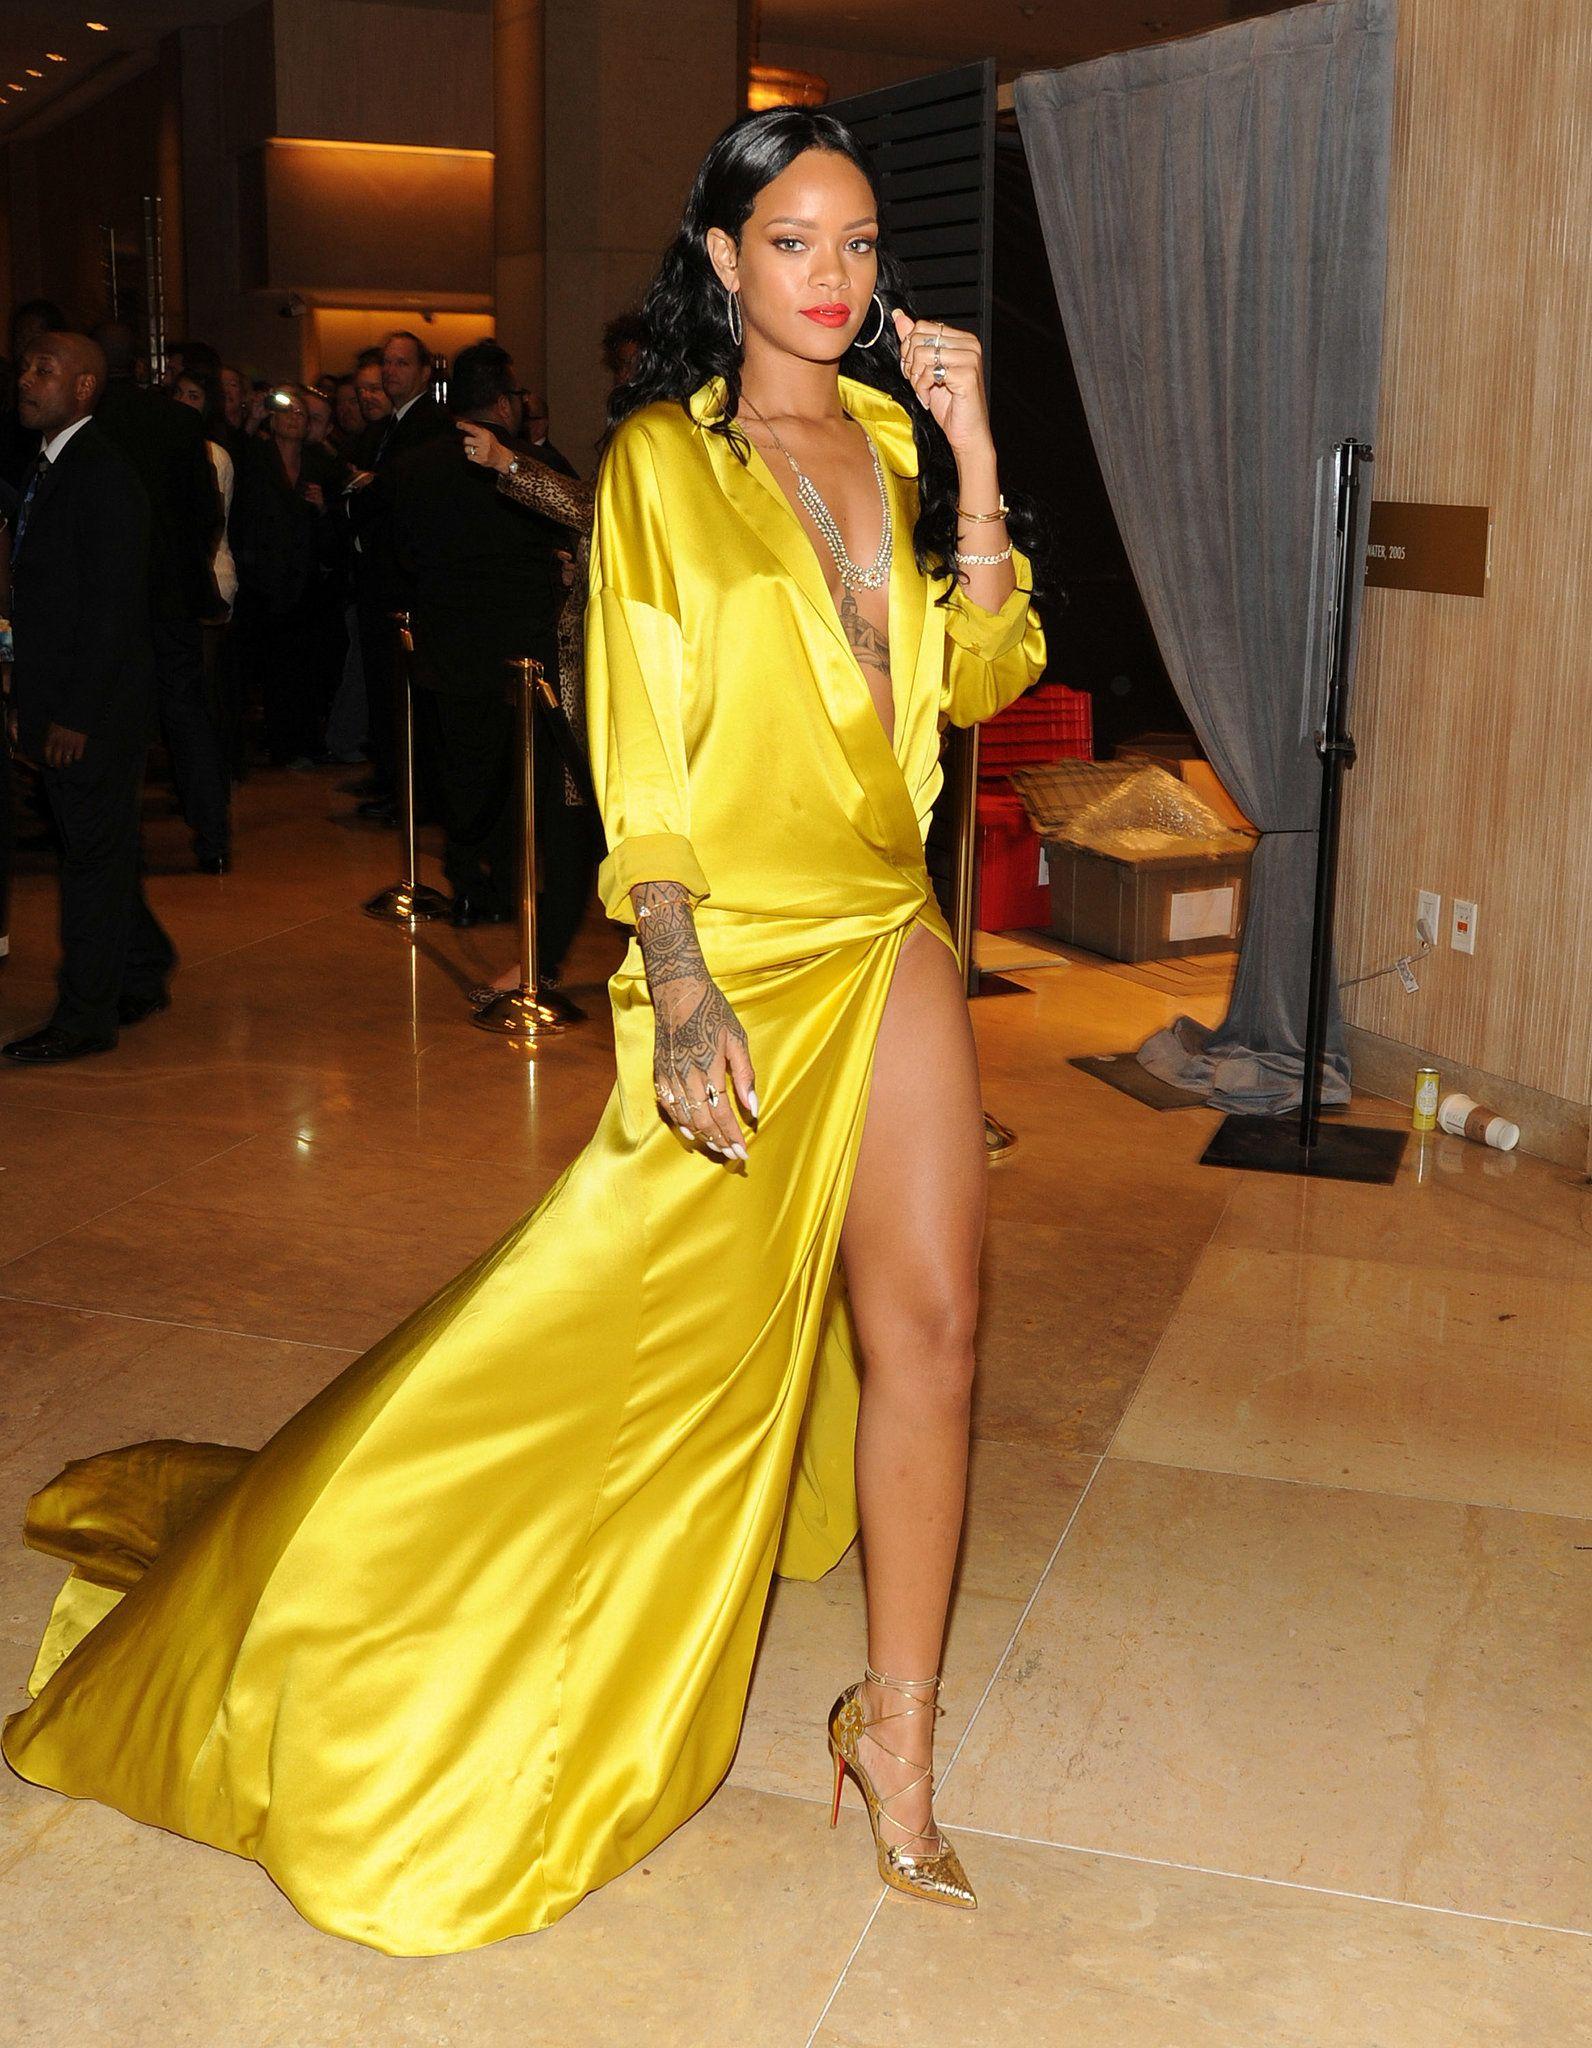 Rihanna at the PreGrammys Gala  Pre party Yellow dress and Rihanna